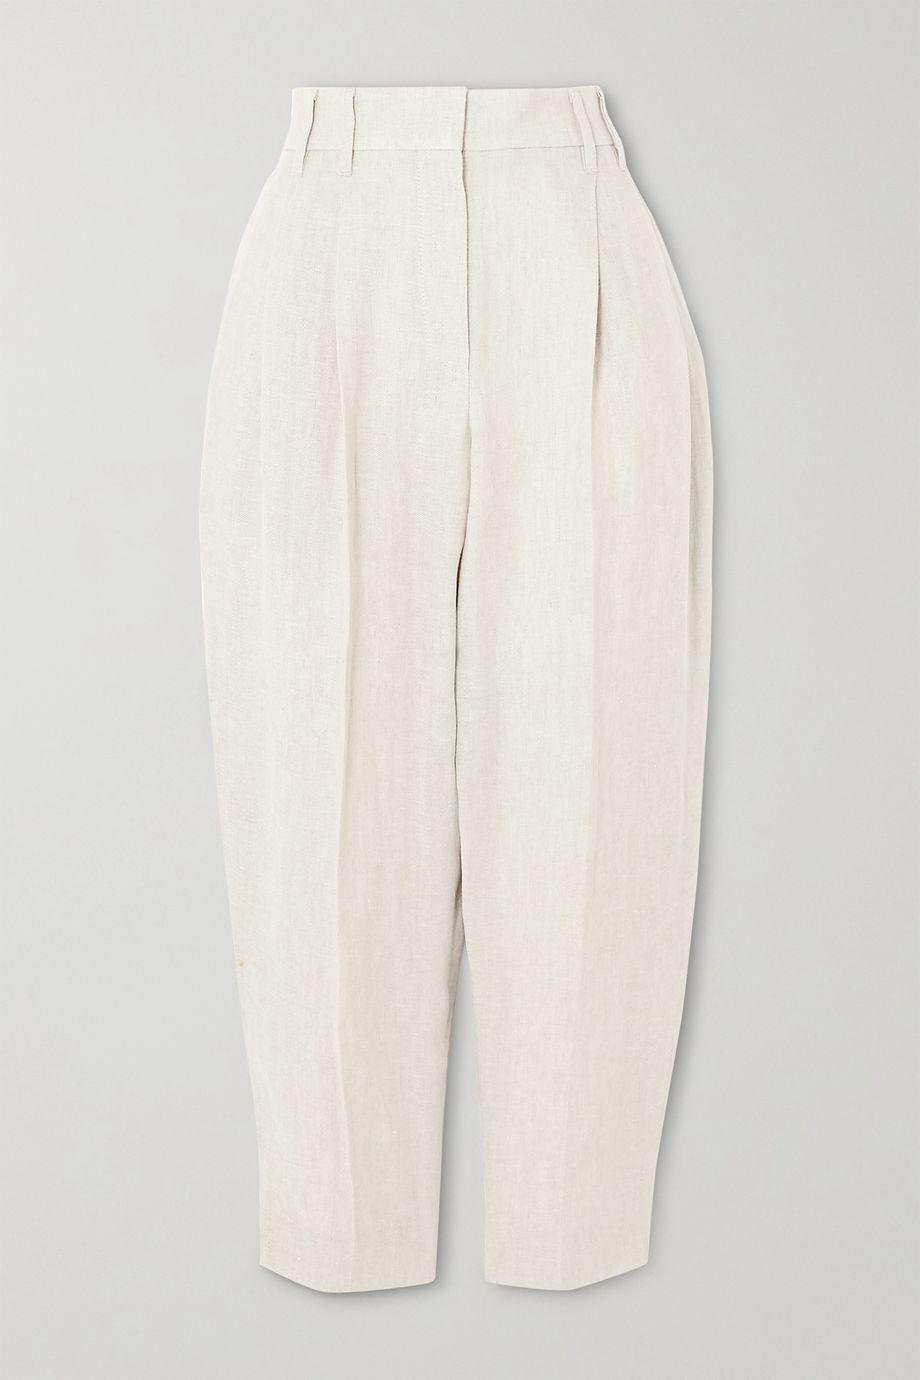 Brunello Cucinelli Linen tapered pants